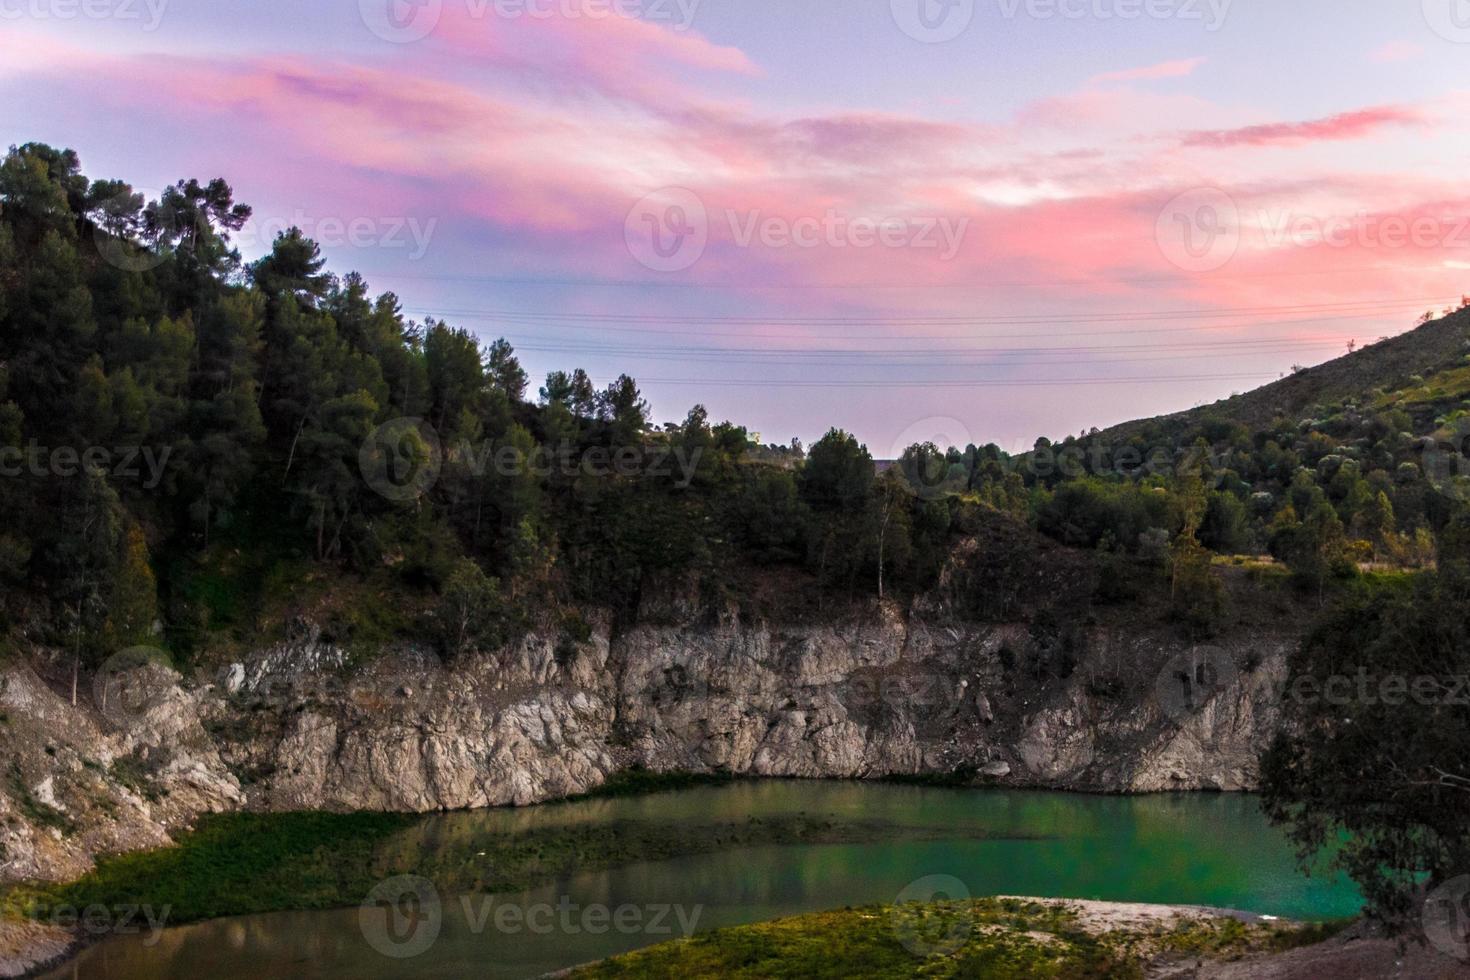 Colorful lake photo